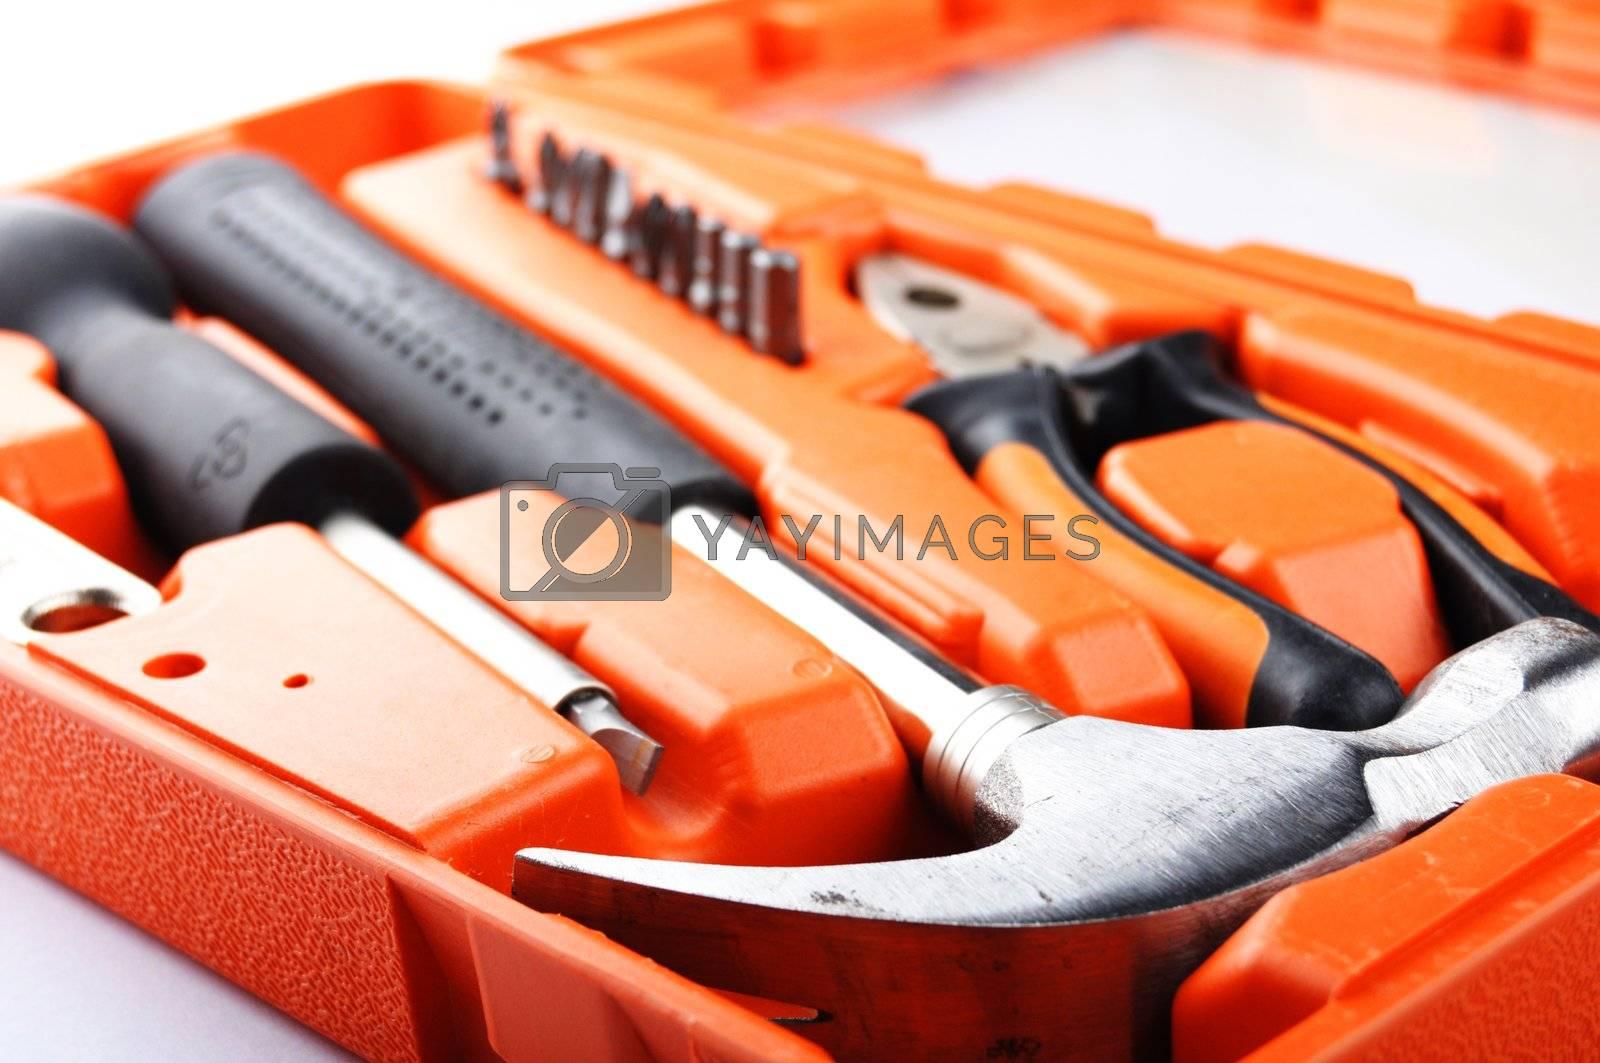 toolbox by gunnar3000